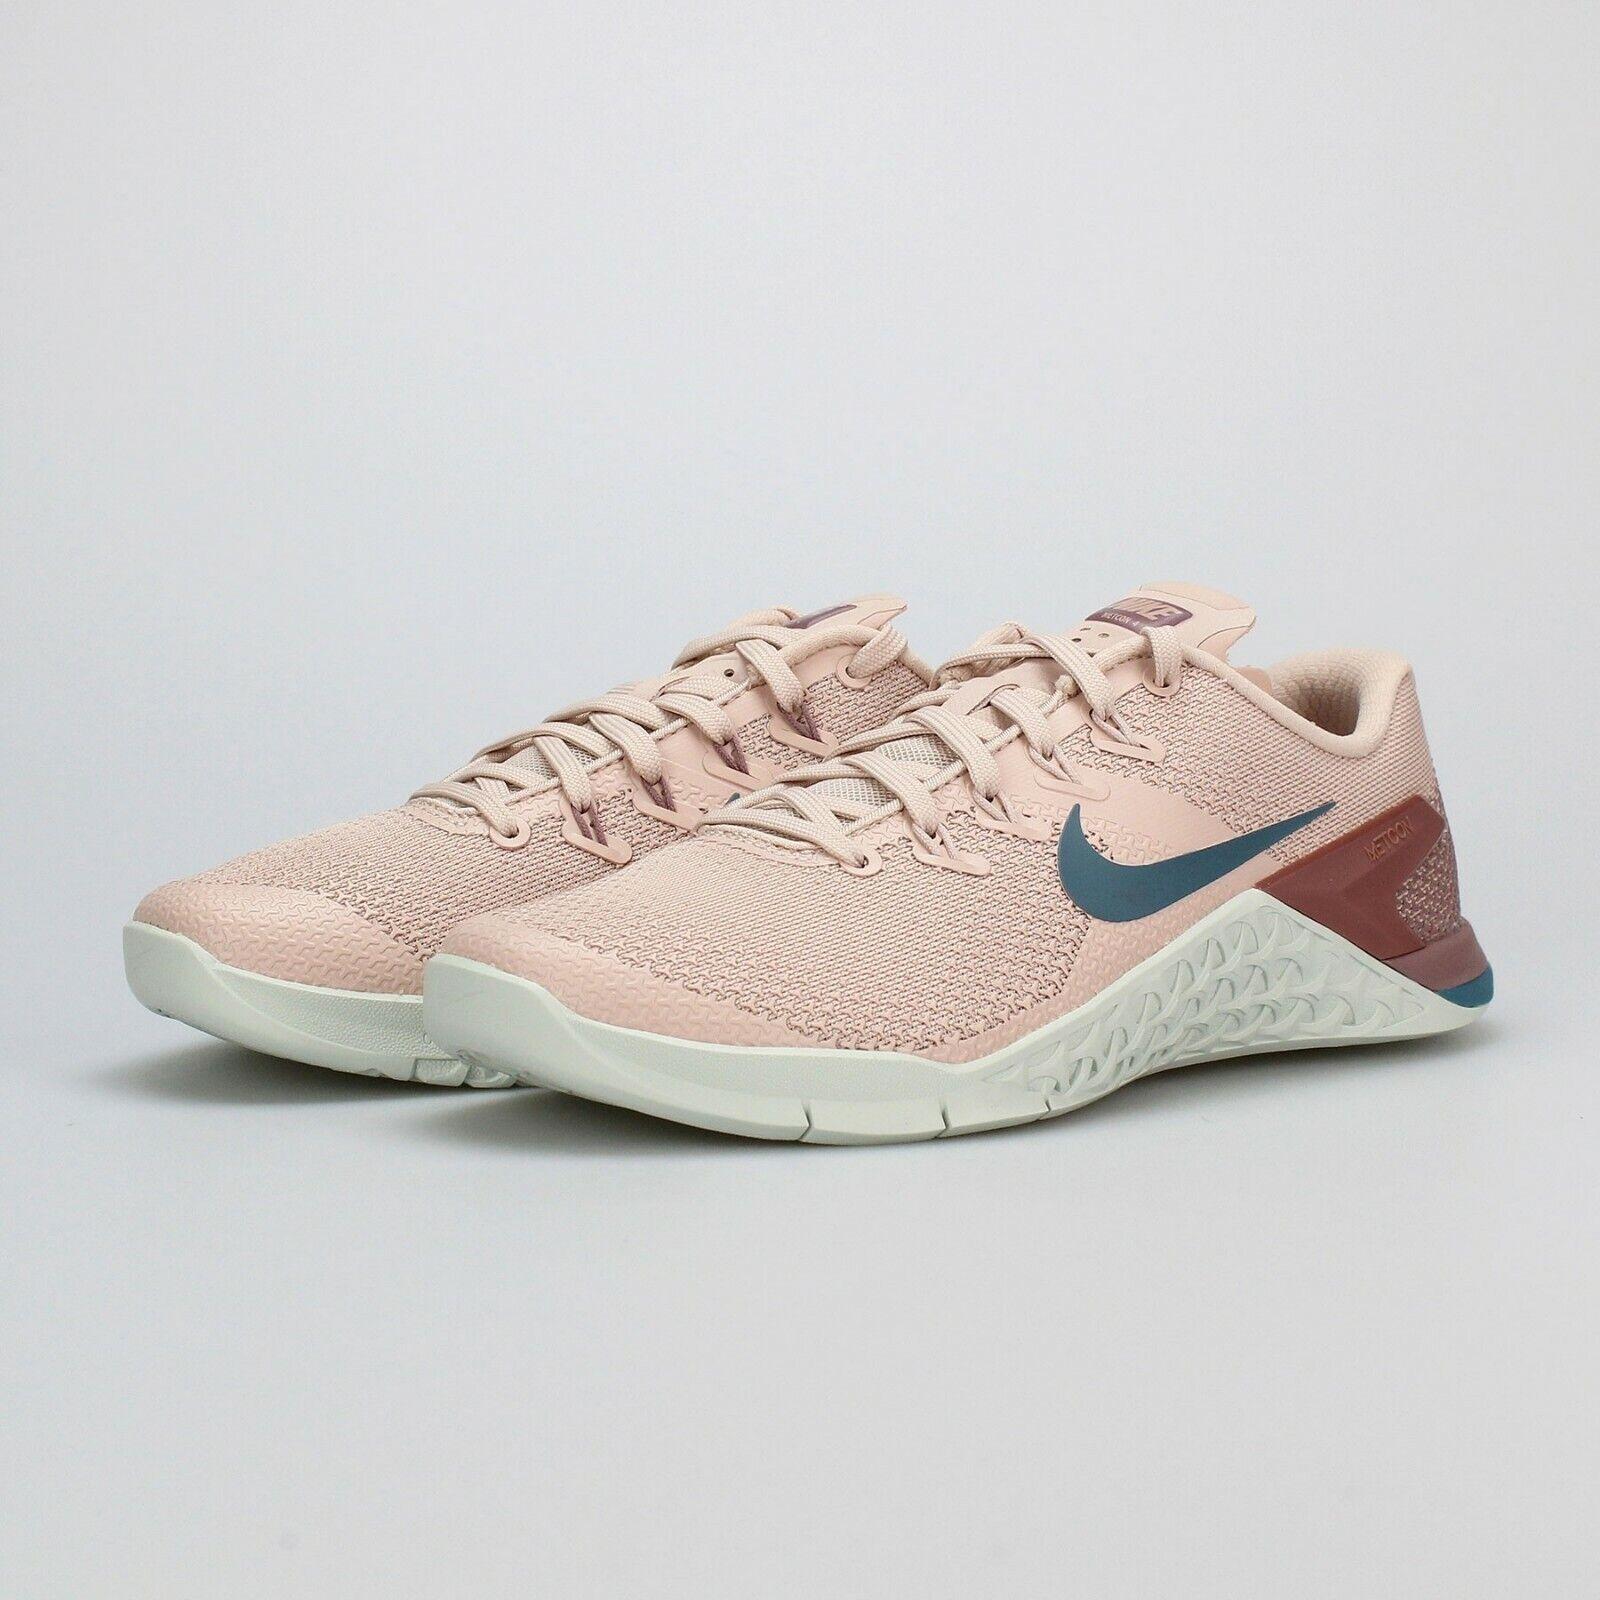 Nike Women's Metcon 4 (Particle Beige) - UK 5.5 (EUR 39) -New  92453 240